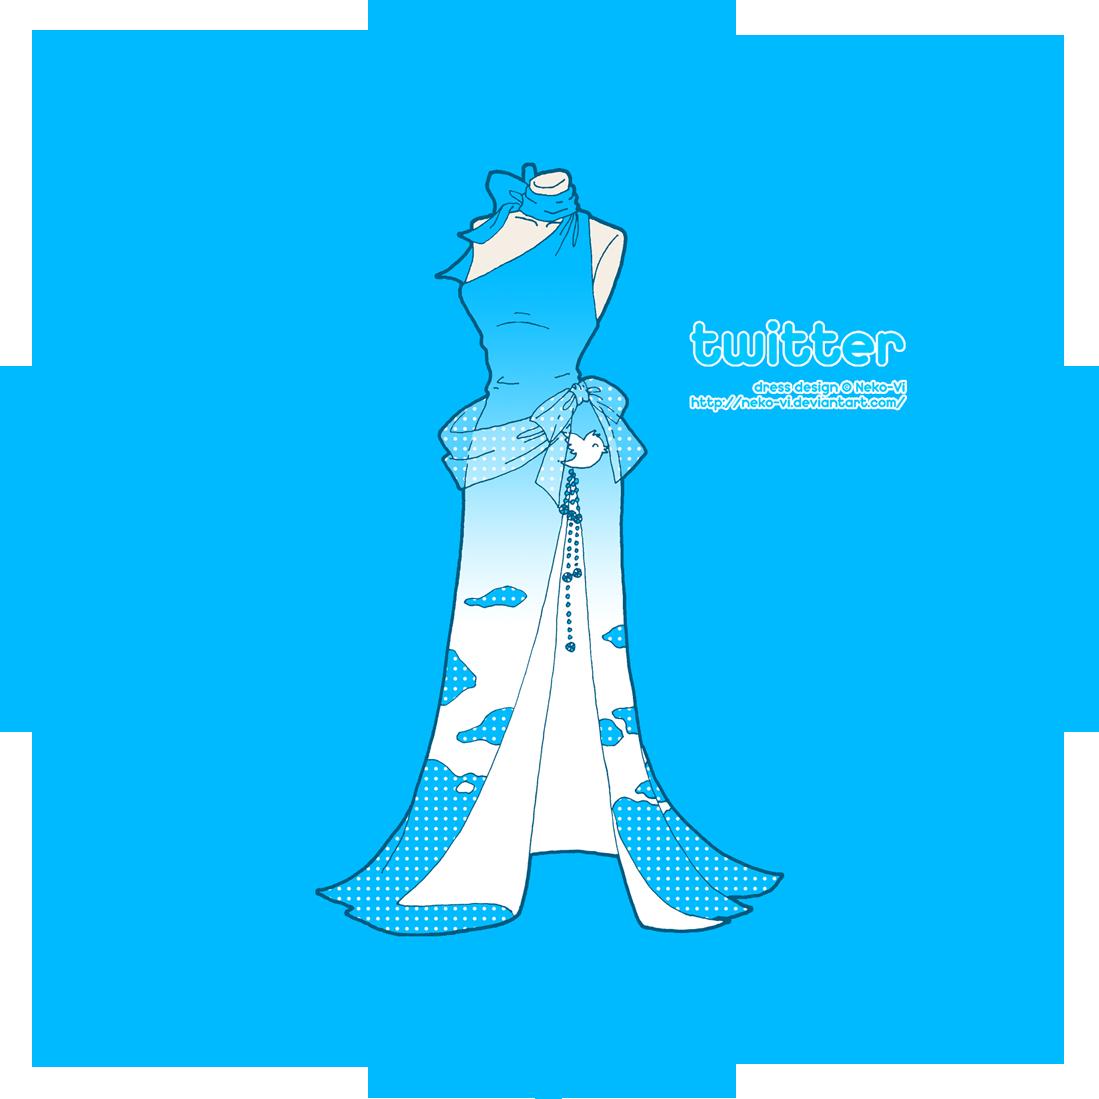 Twitter in Fashion by Neko-Vi